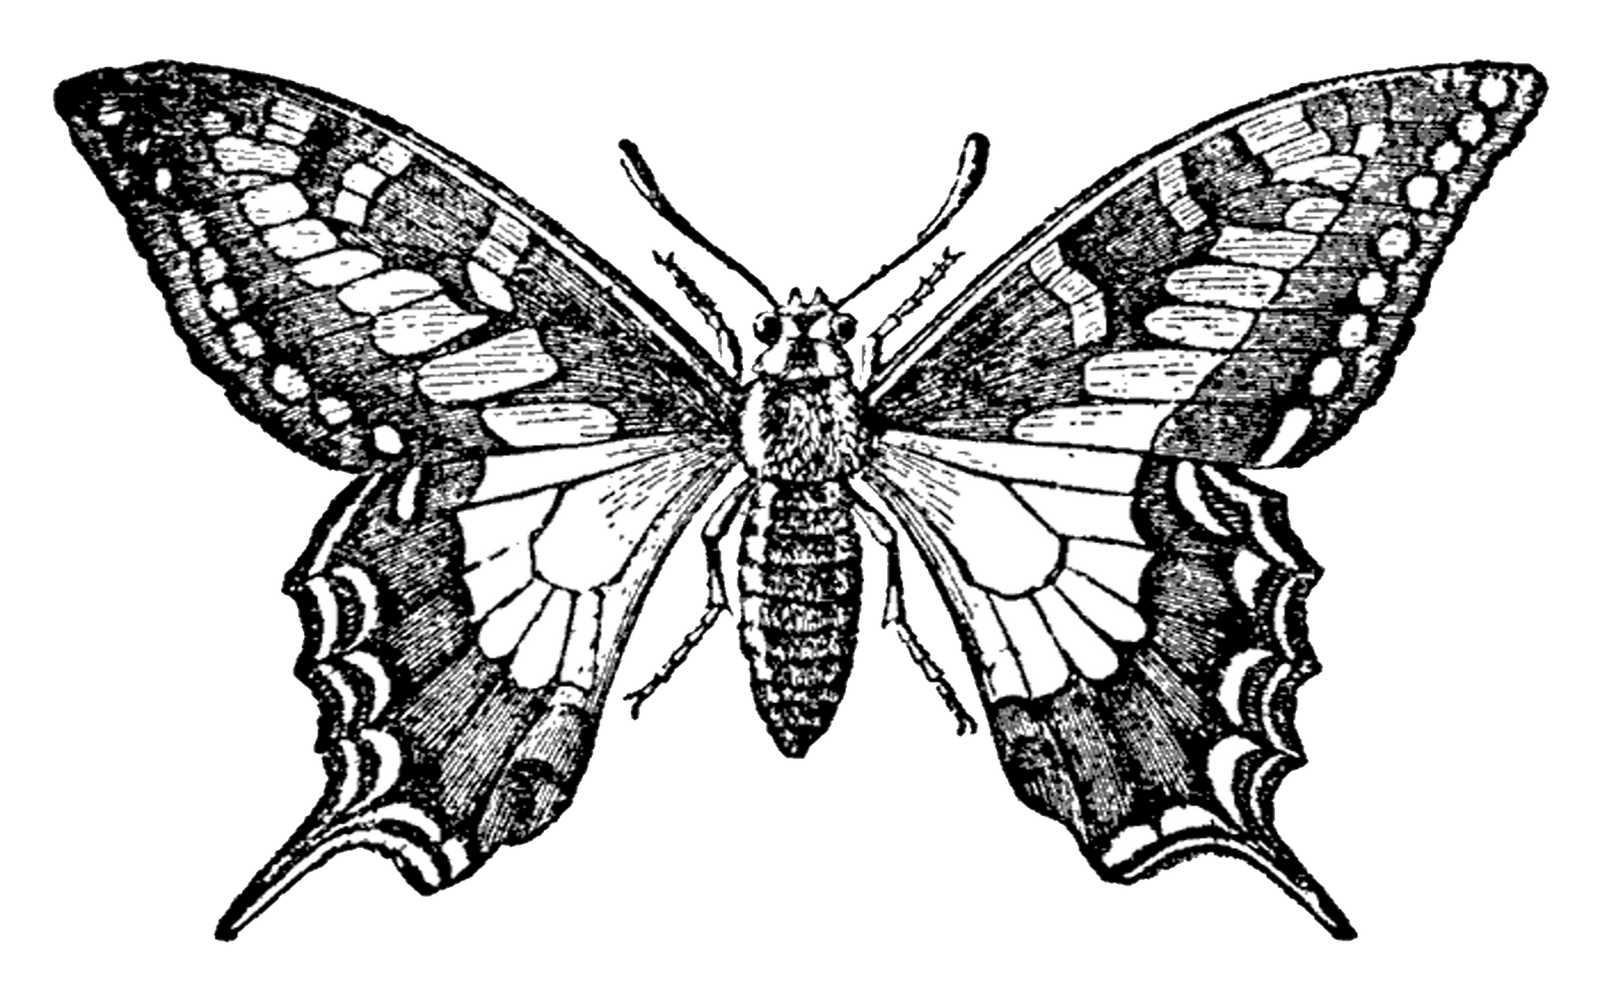 Black And White Vintage Background Png Black and white butterflyVintage Butterfly Black And White